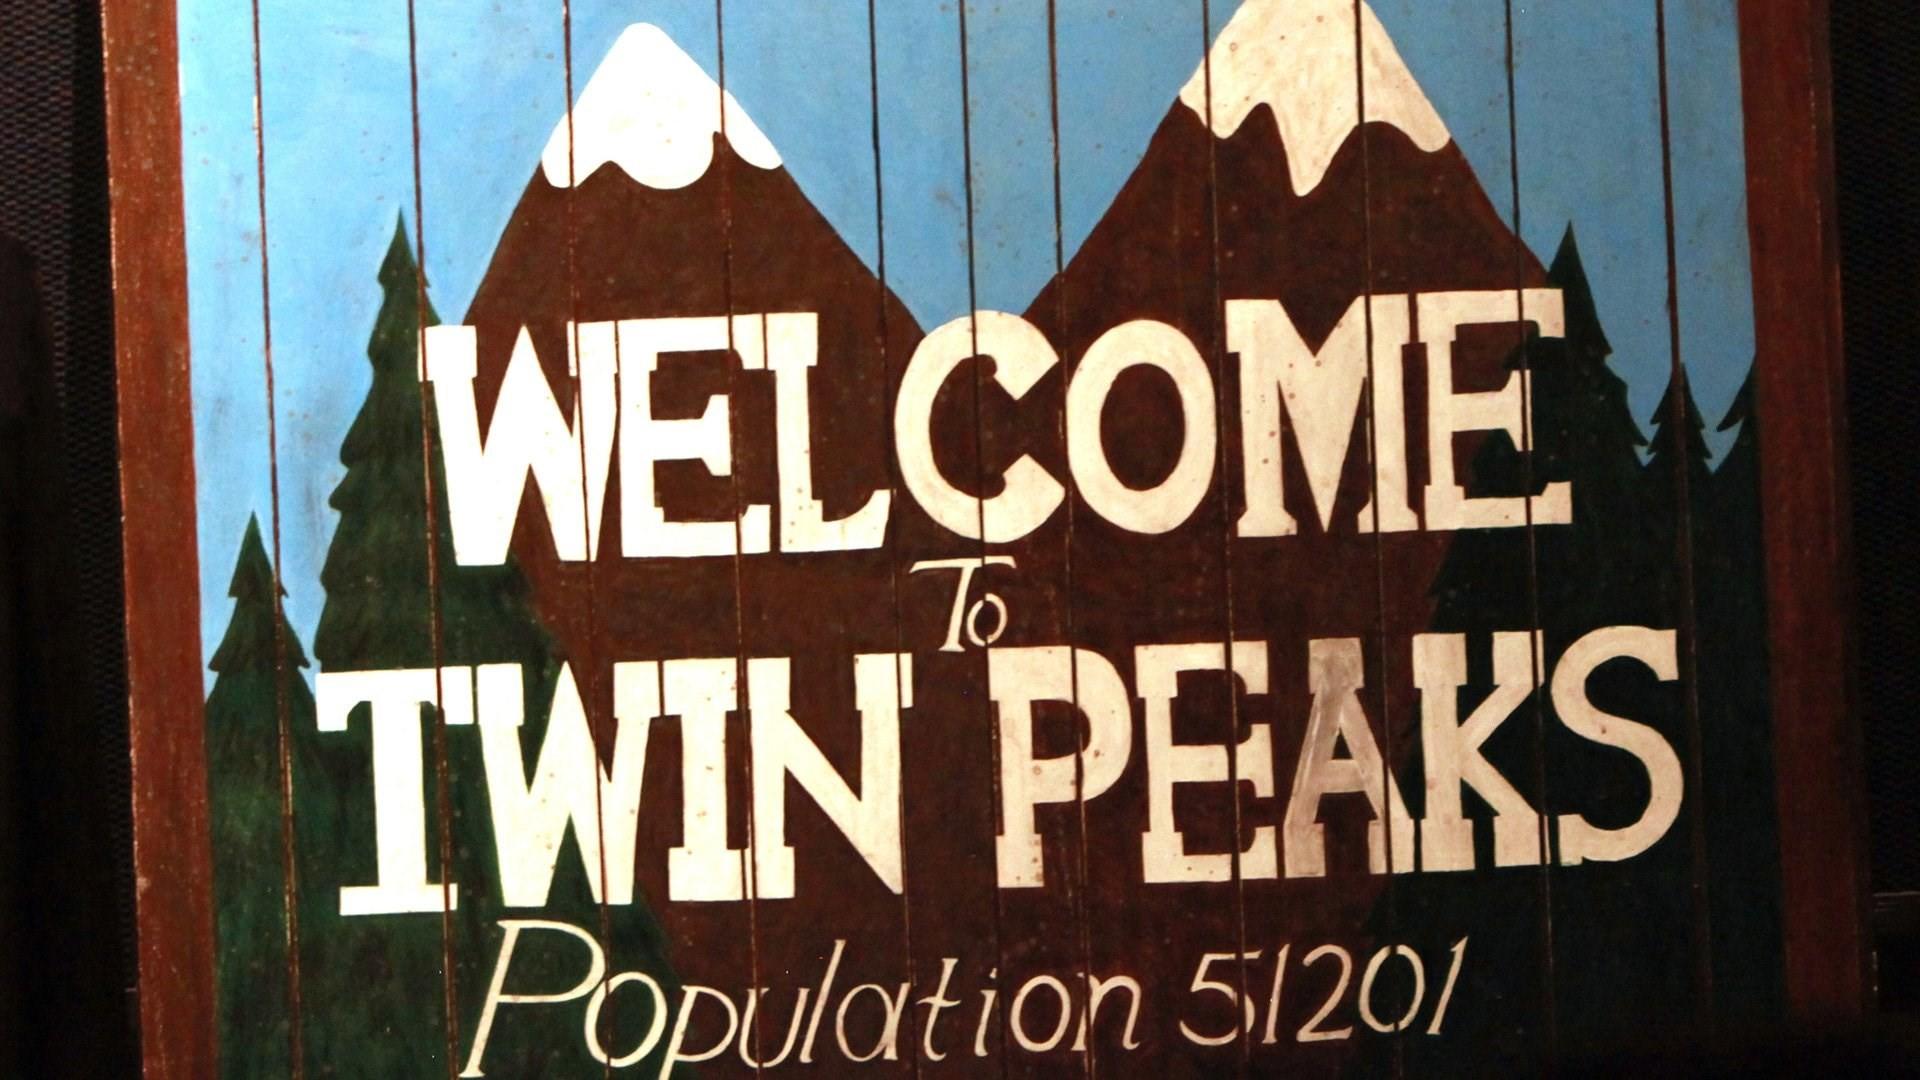 px Awesome twin peaks backround by Caulton Turner for :  pocketfullofgrace.com